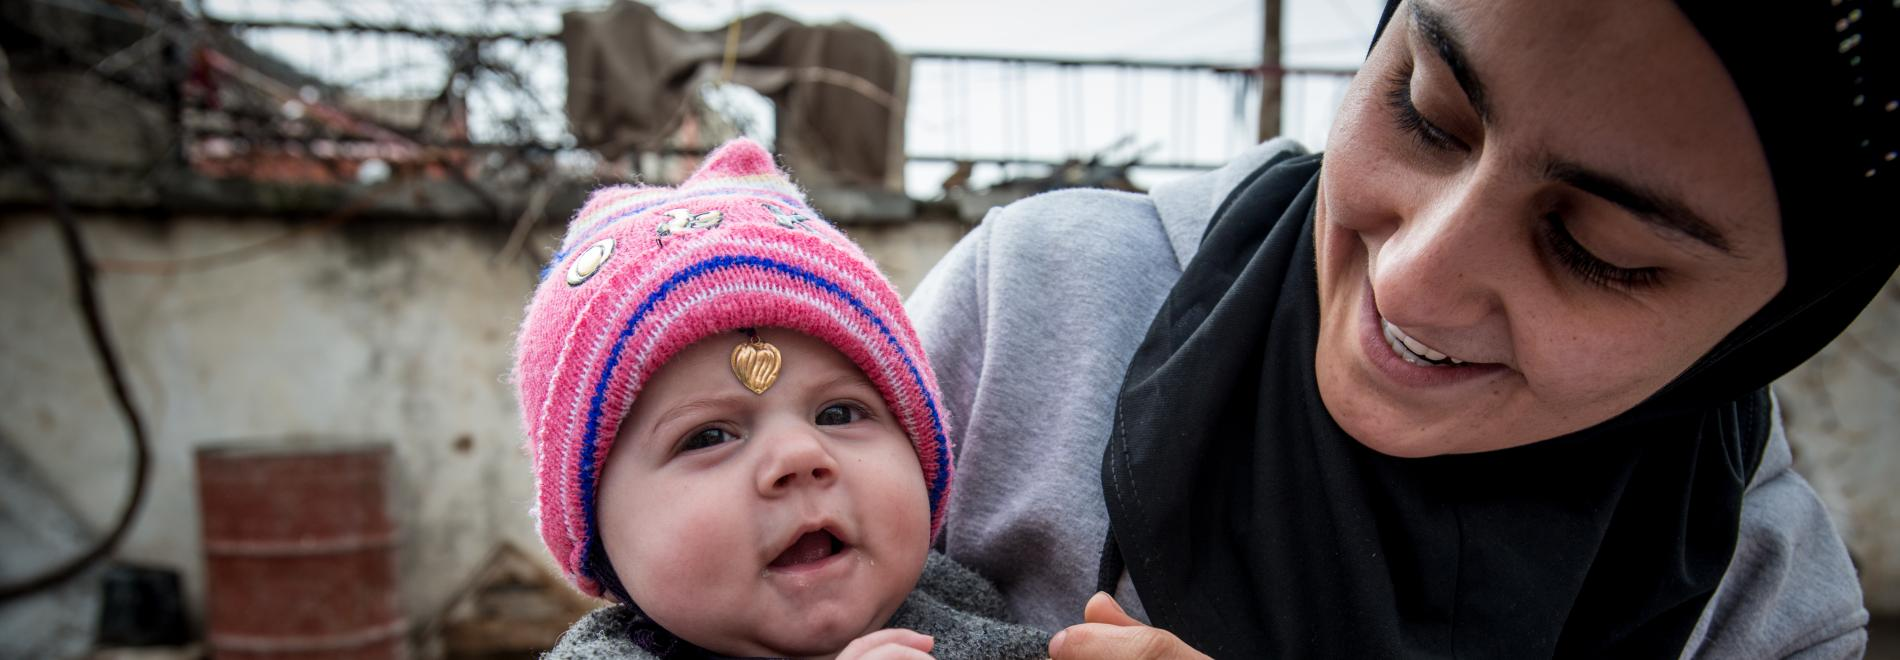 Mutter mit Kind im Irak. Foto: Guillaume Pinon